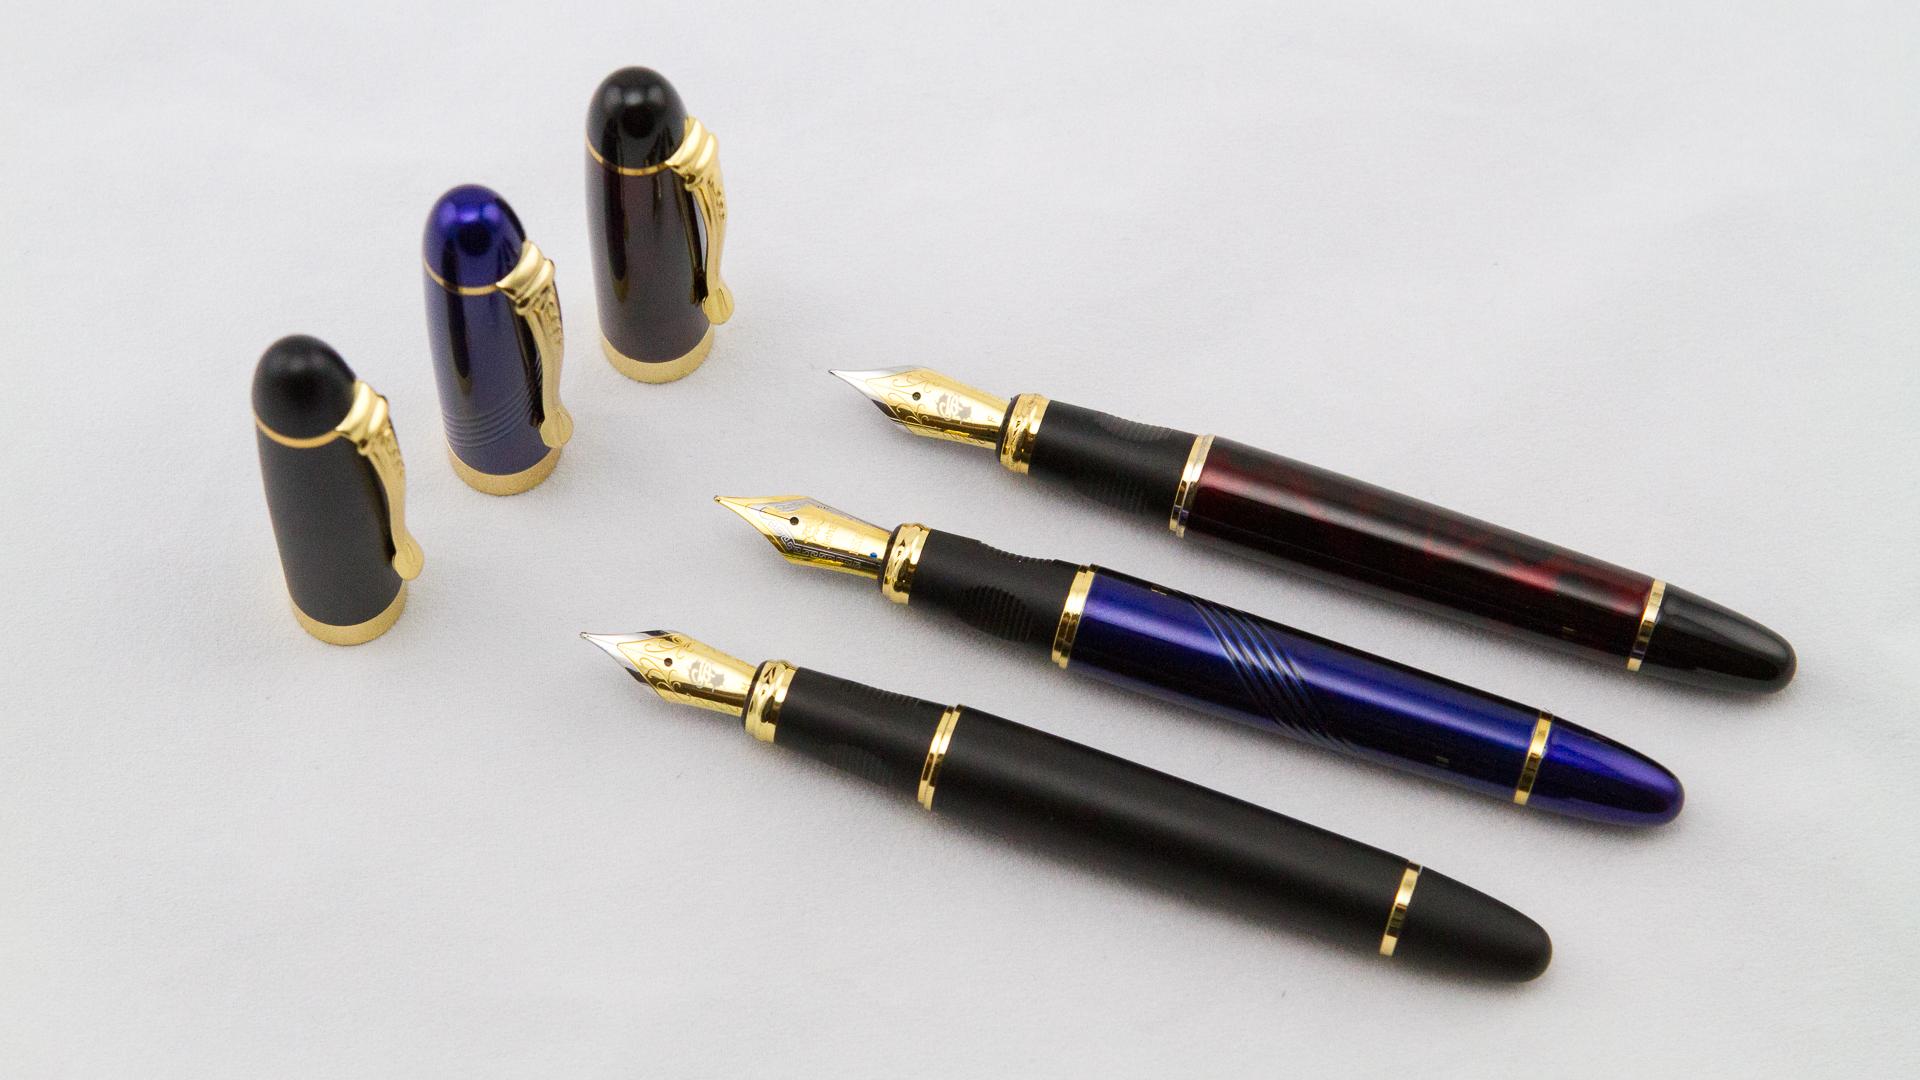 Pen Review: Jinhao X450